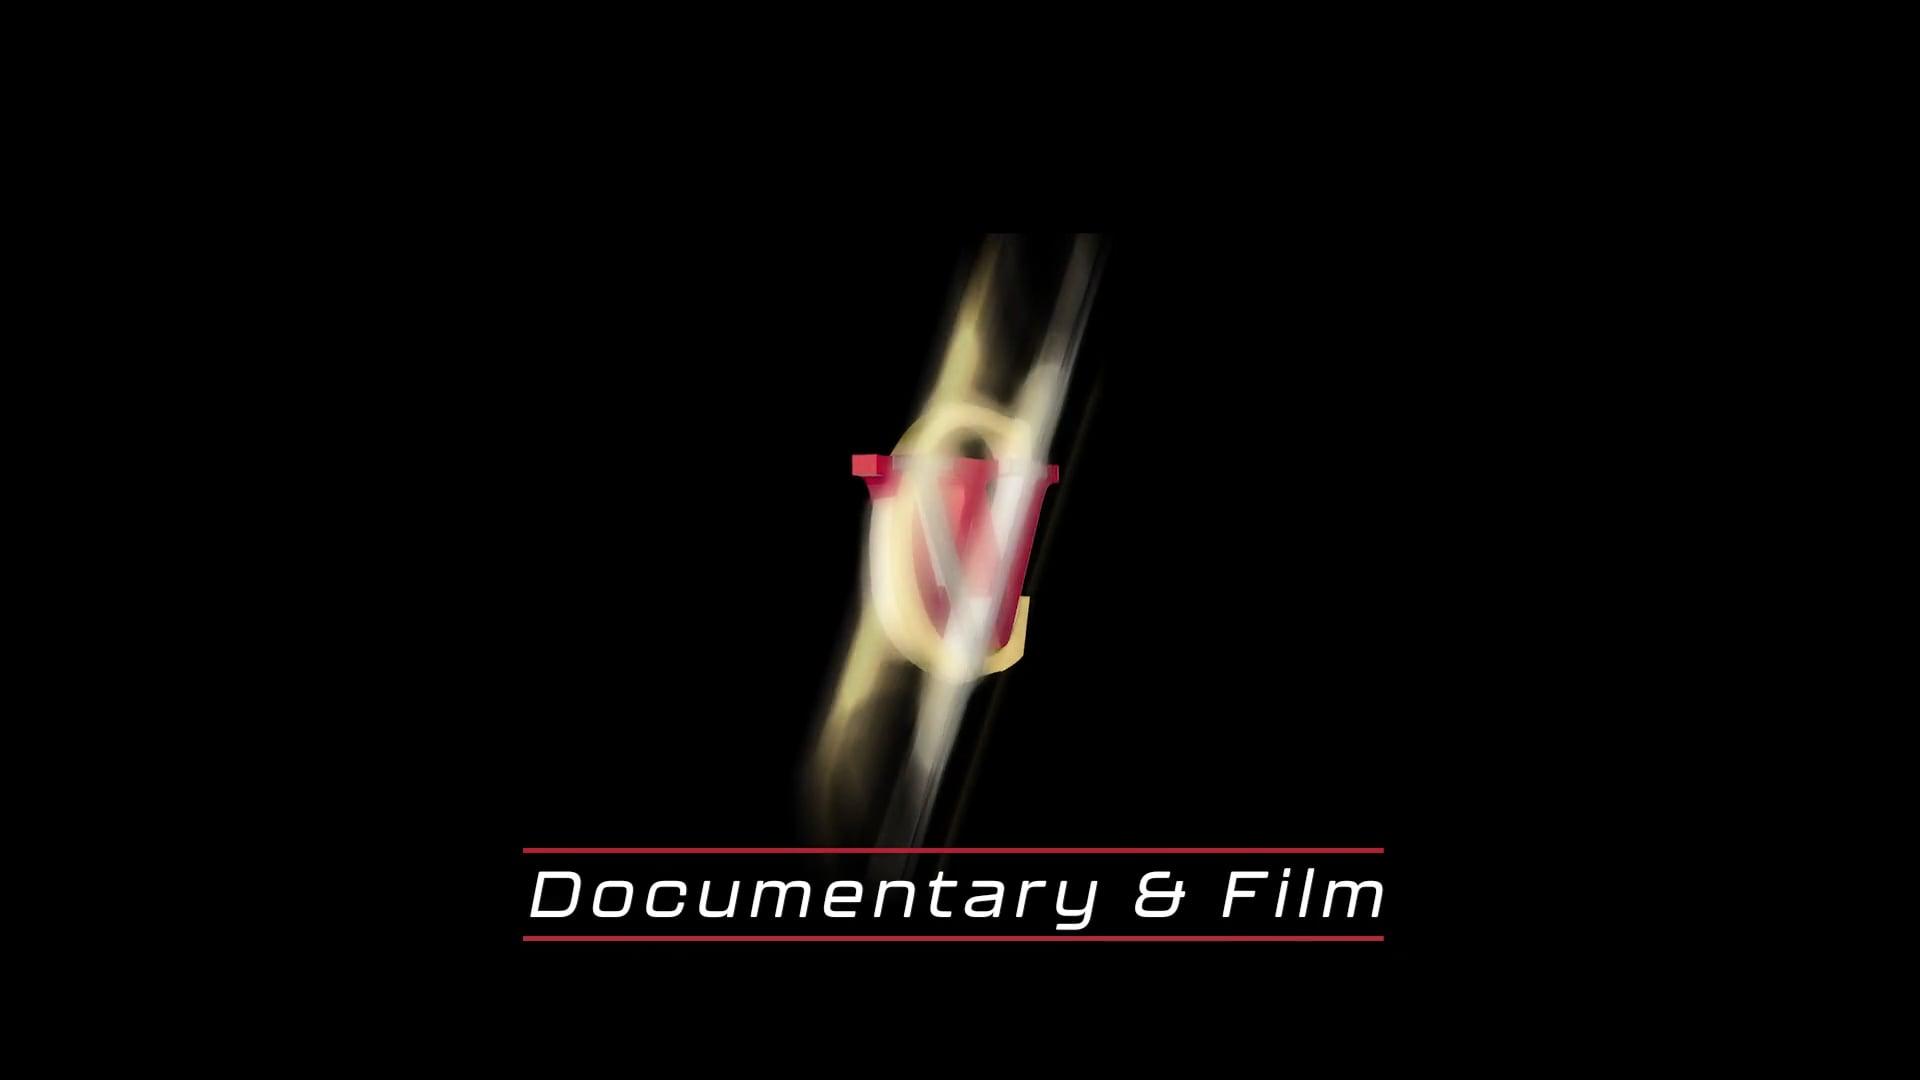 Documentary & Film